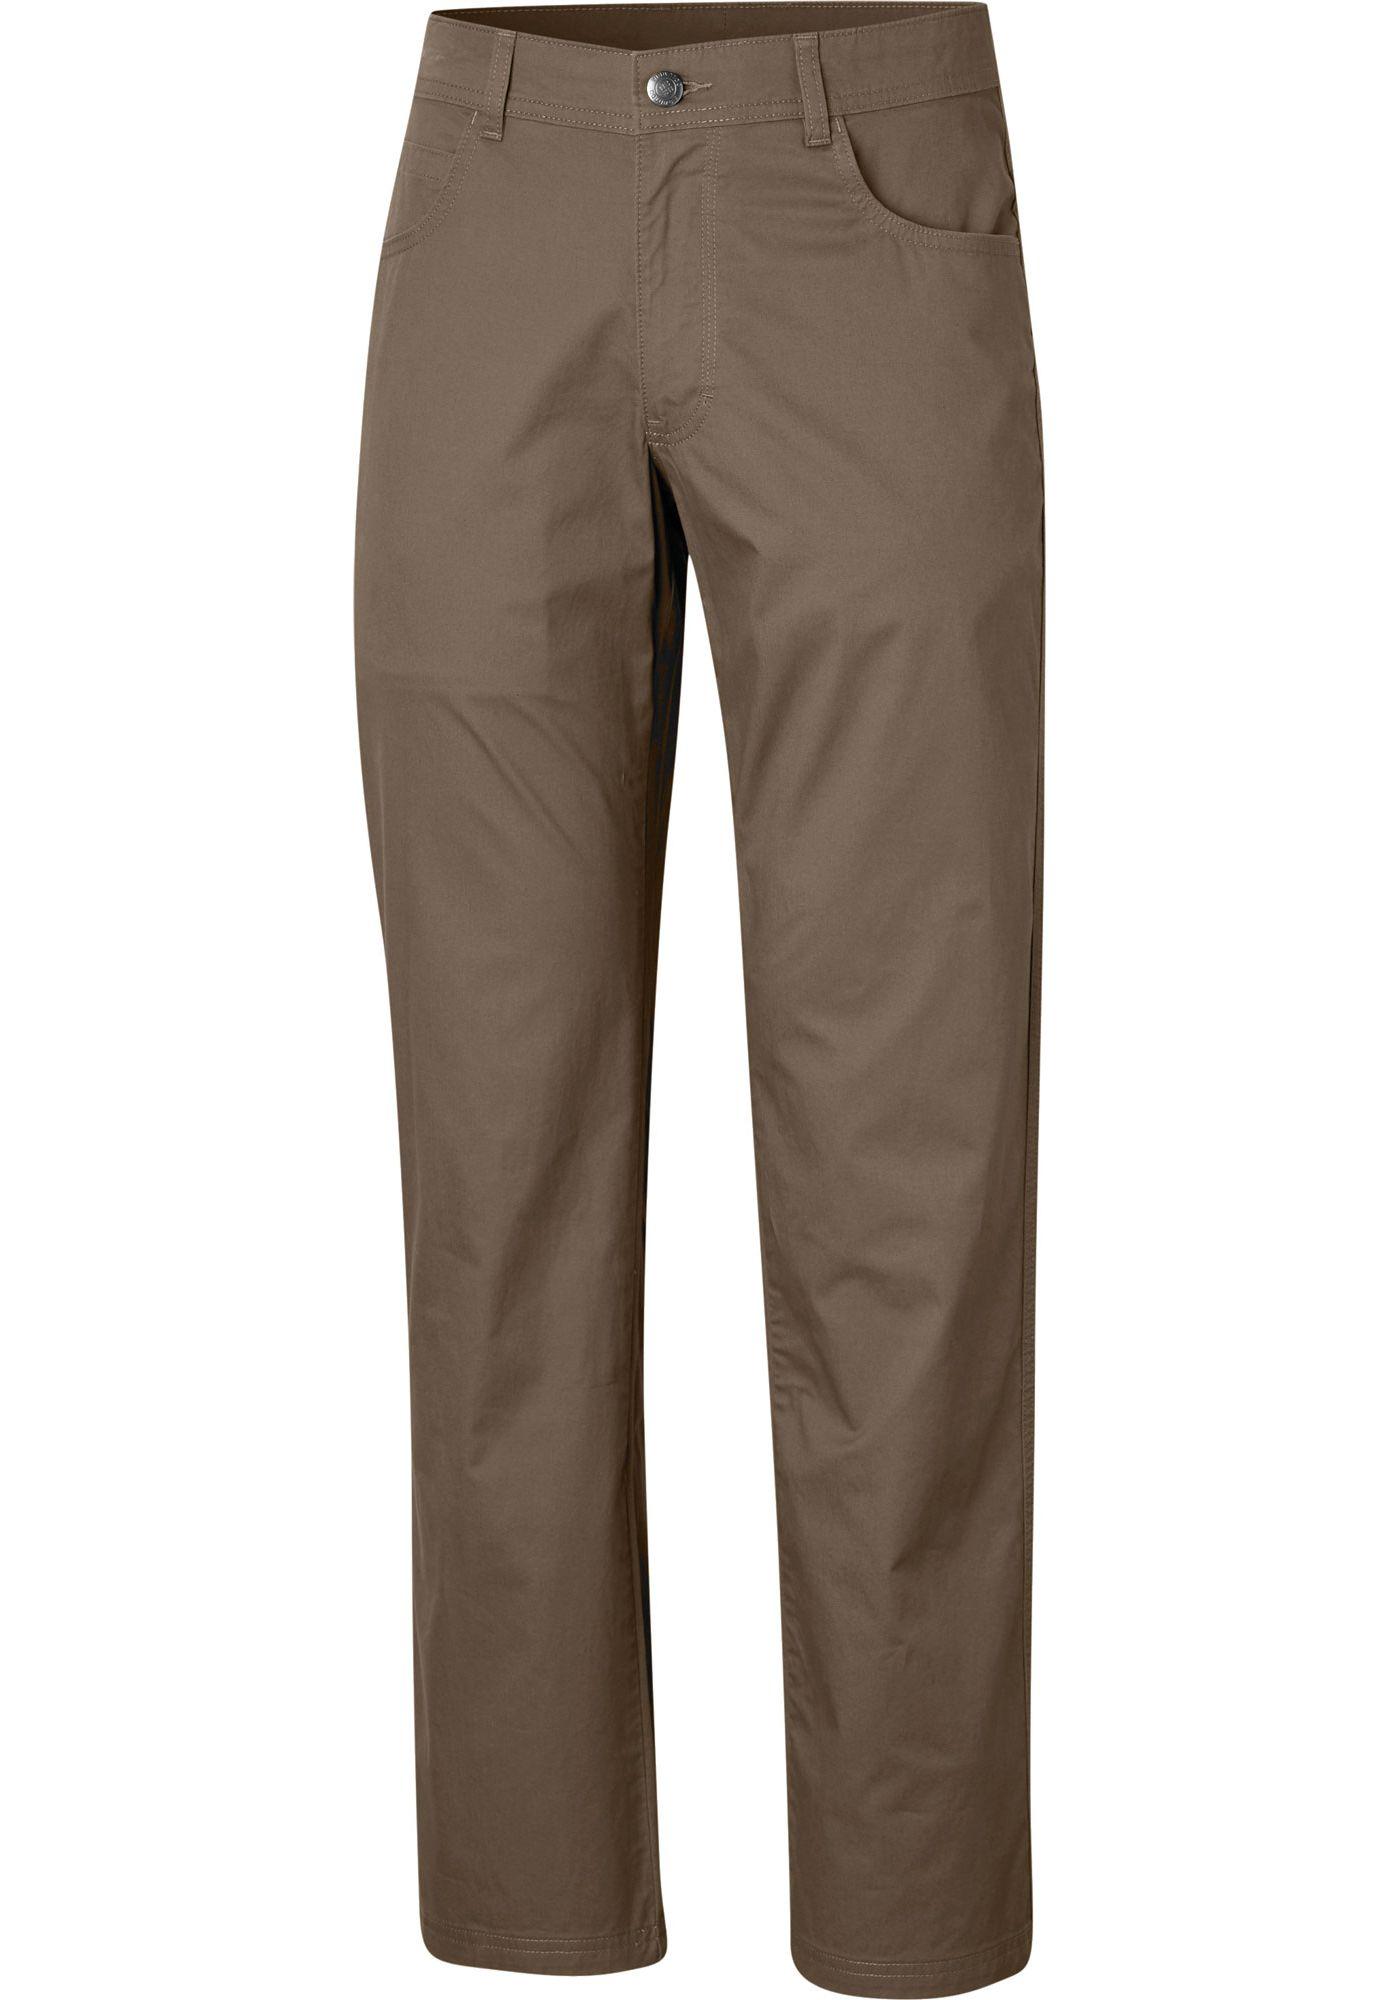 Columbia Men's Rapid Rivers Pants (Regular and Big & Tall)